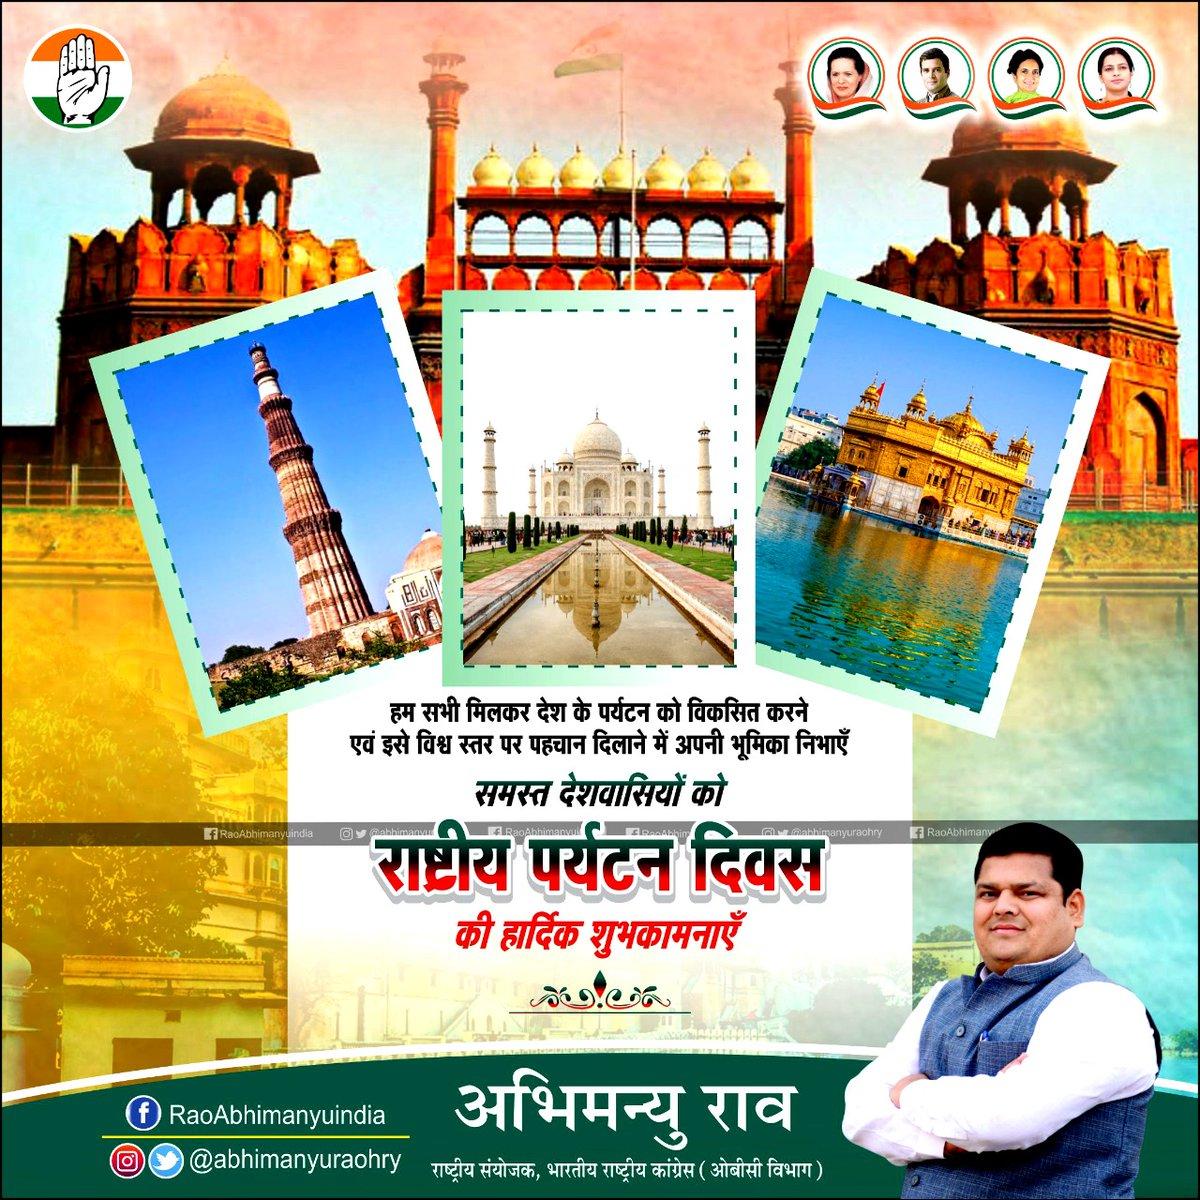 समस्त देशवासियों को #राष्ट्रीय_पर्यटन_दिवस की हार्दिक शुभकामनाएँ  #NationalTourismDay  #Tourism